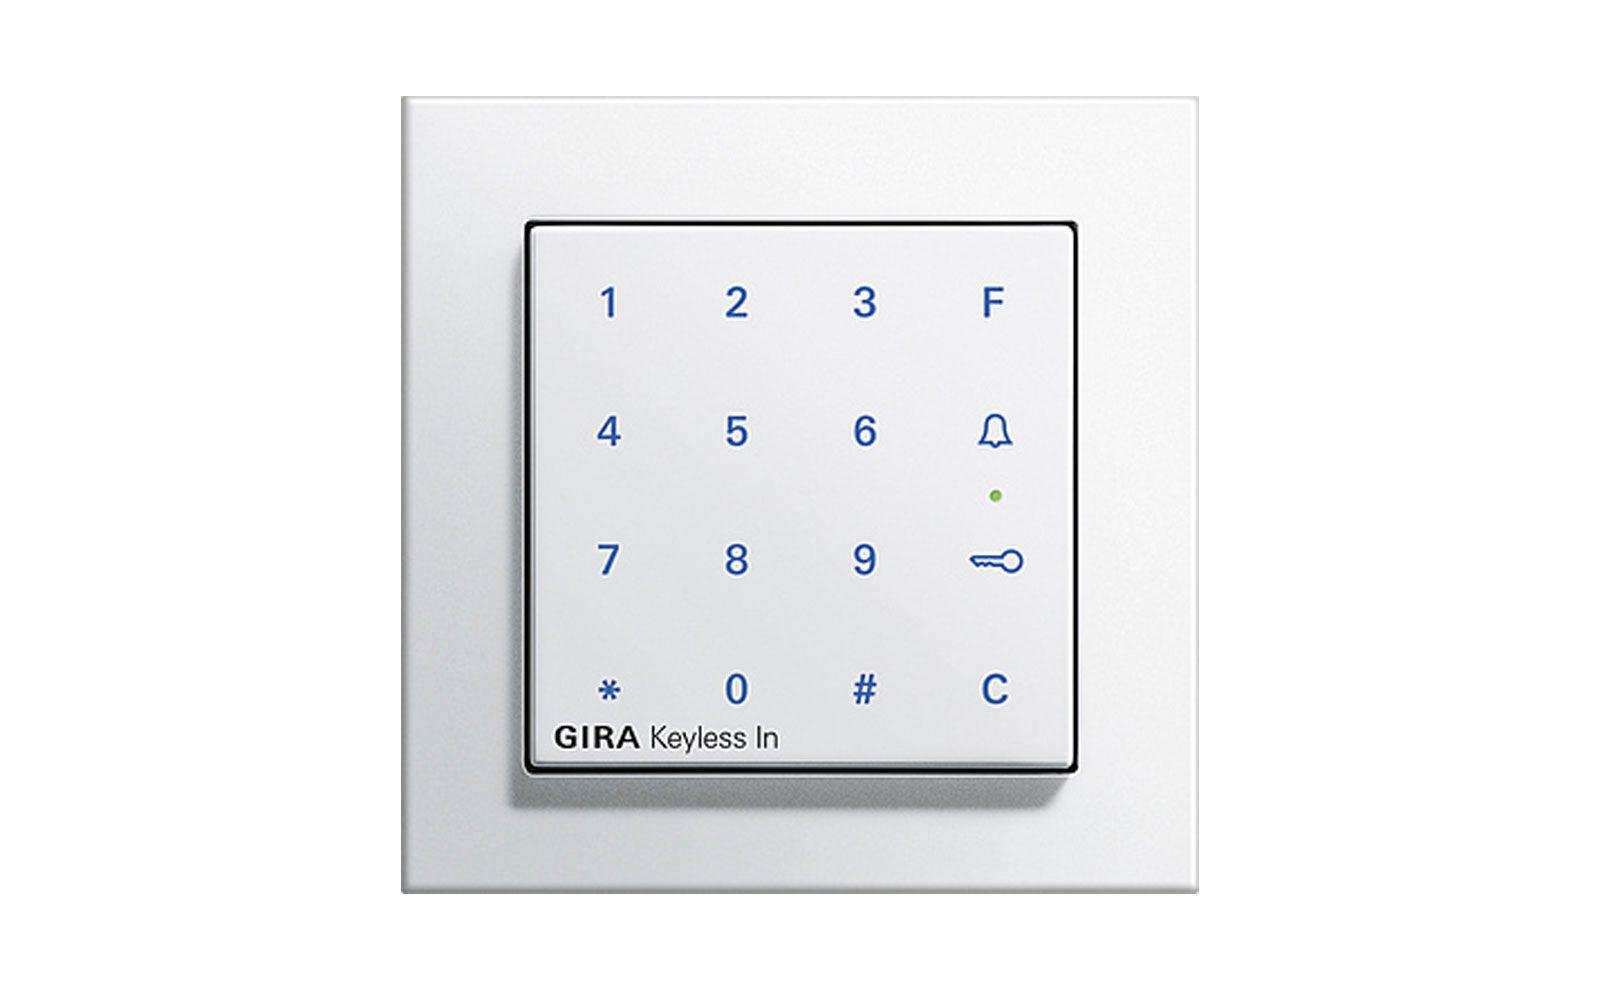 Gira-Keyless-Codetastatur_19394_1558347767.jpg